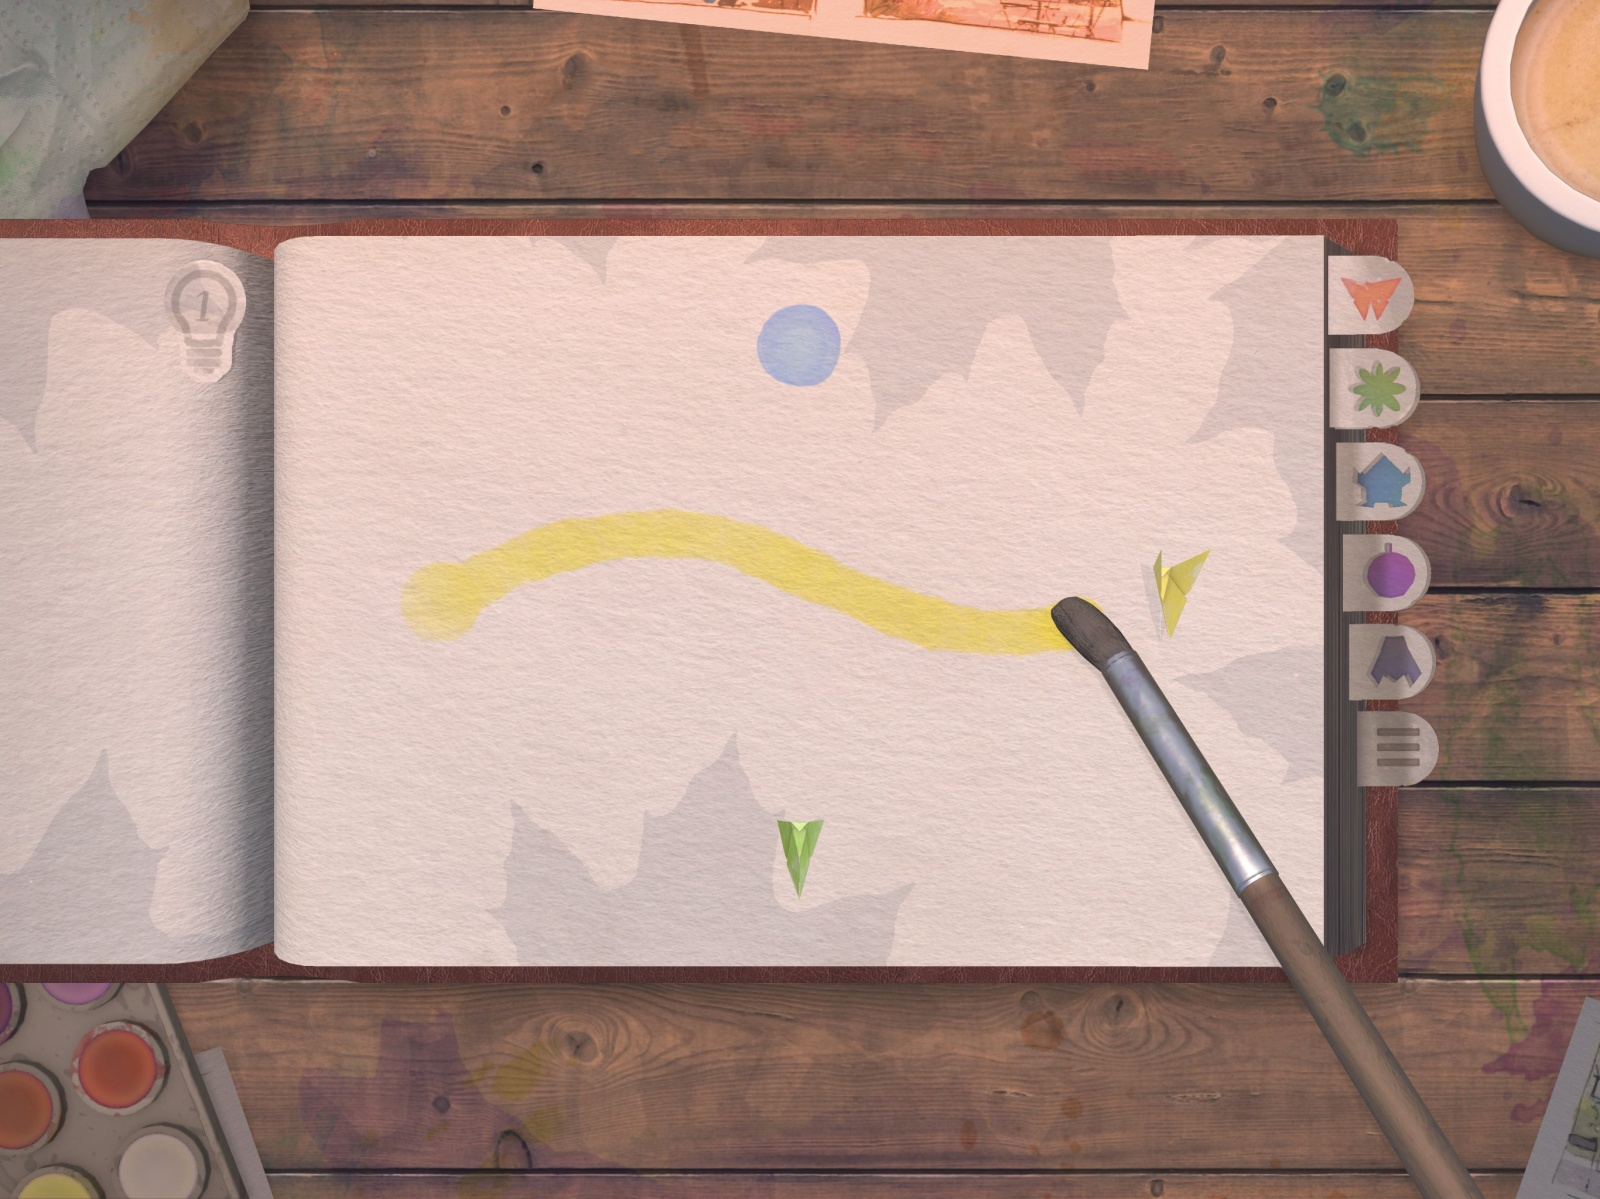 Реализация эффекта акварели в играх - 23